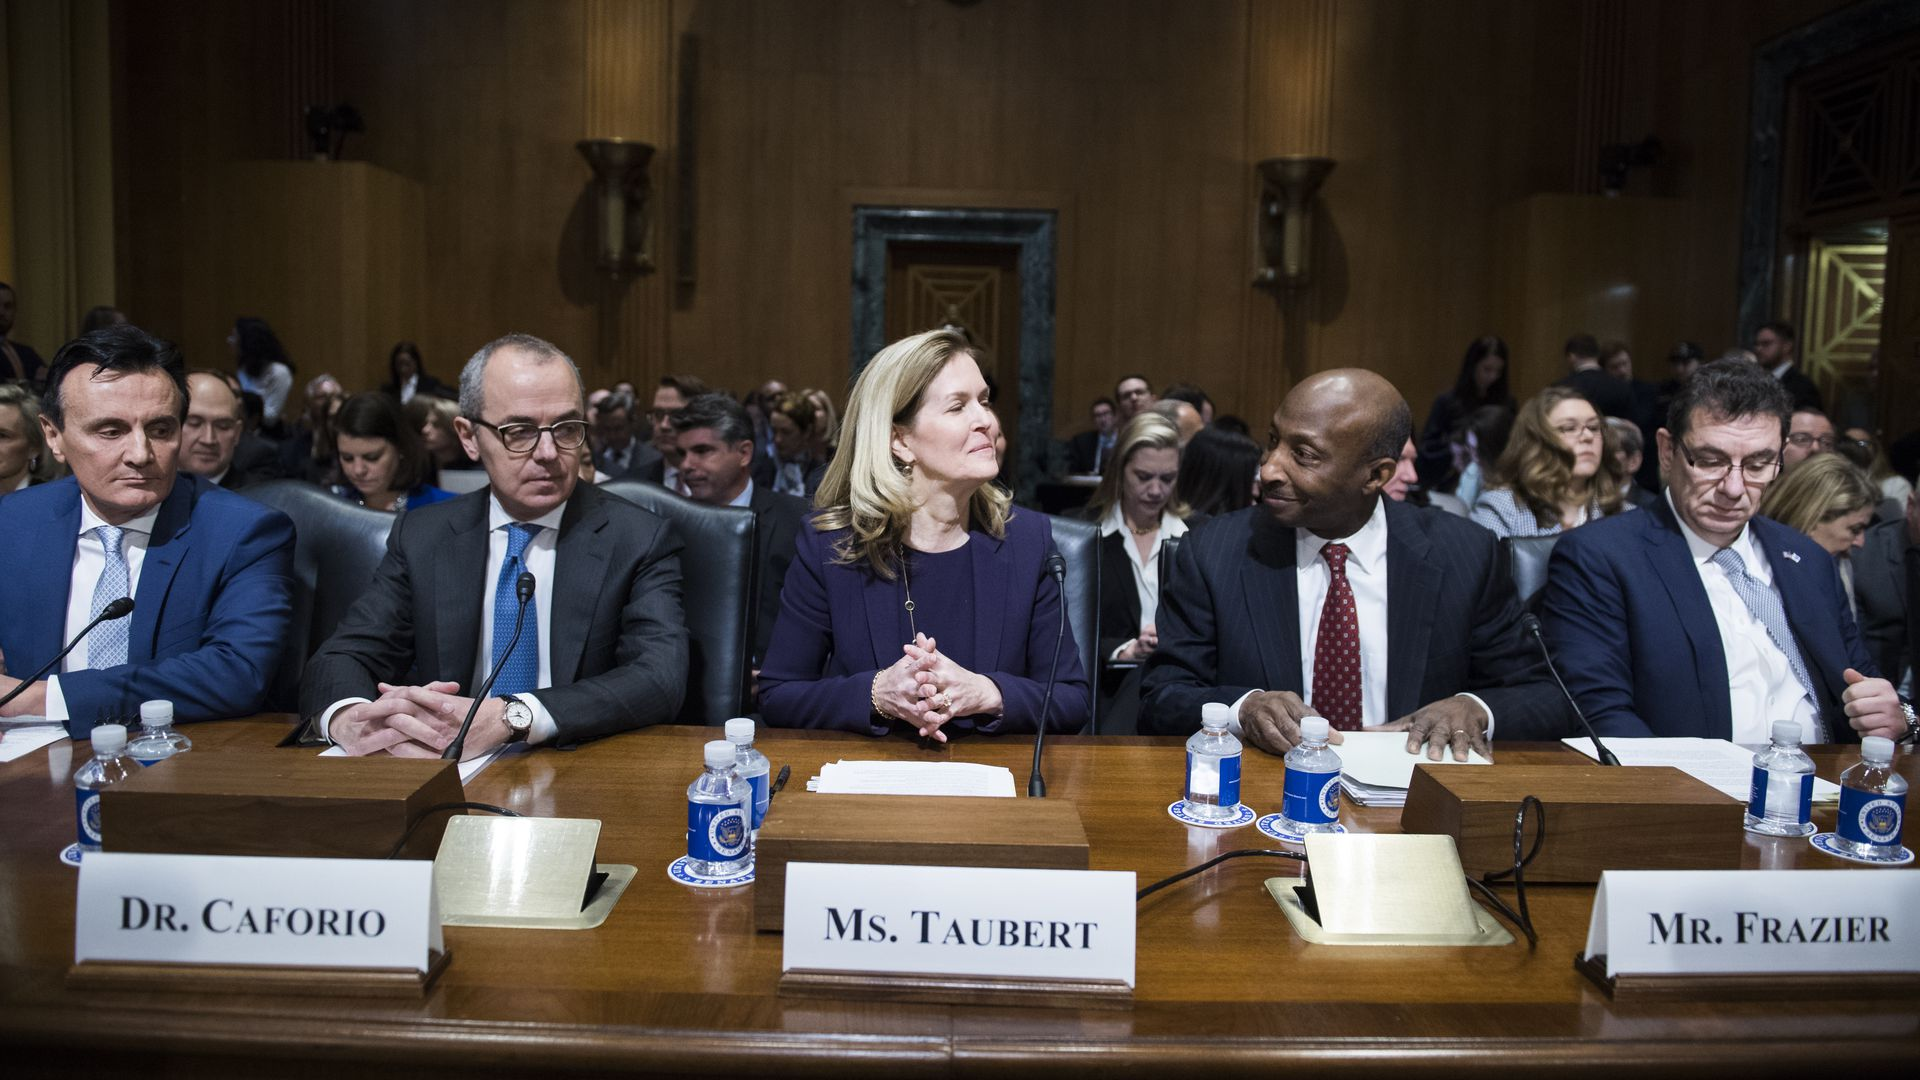 Pharmaceutical executives sit behind a table during U.S. Senate testimony.